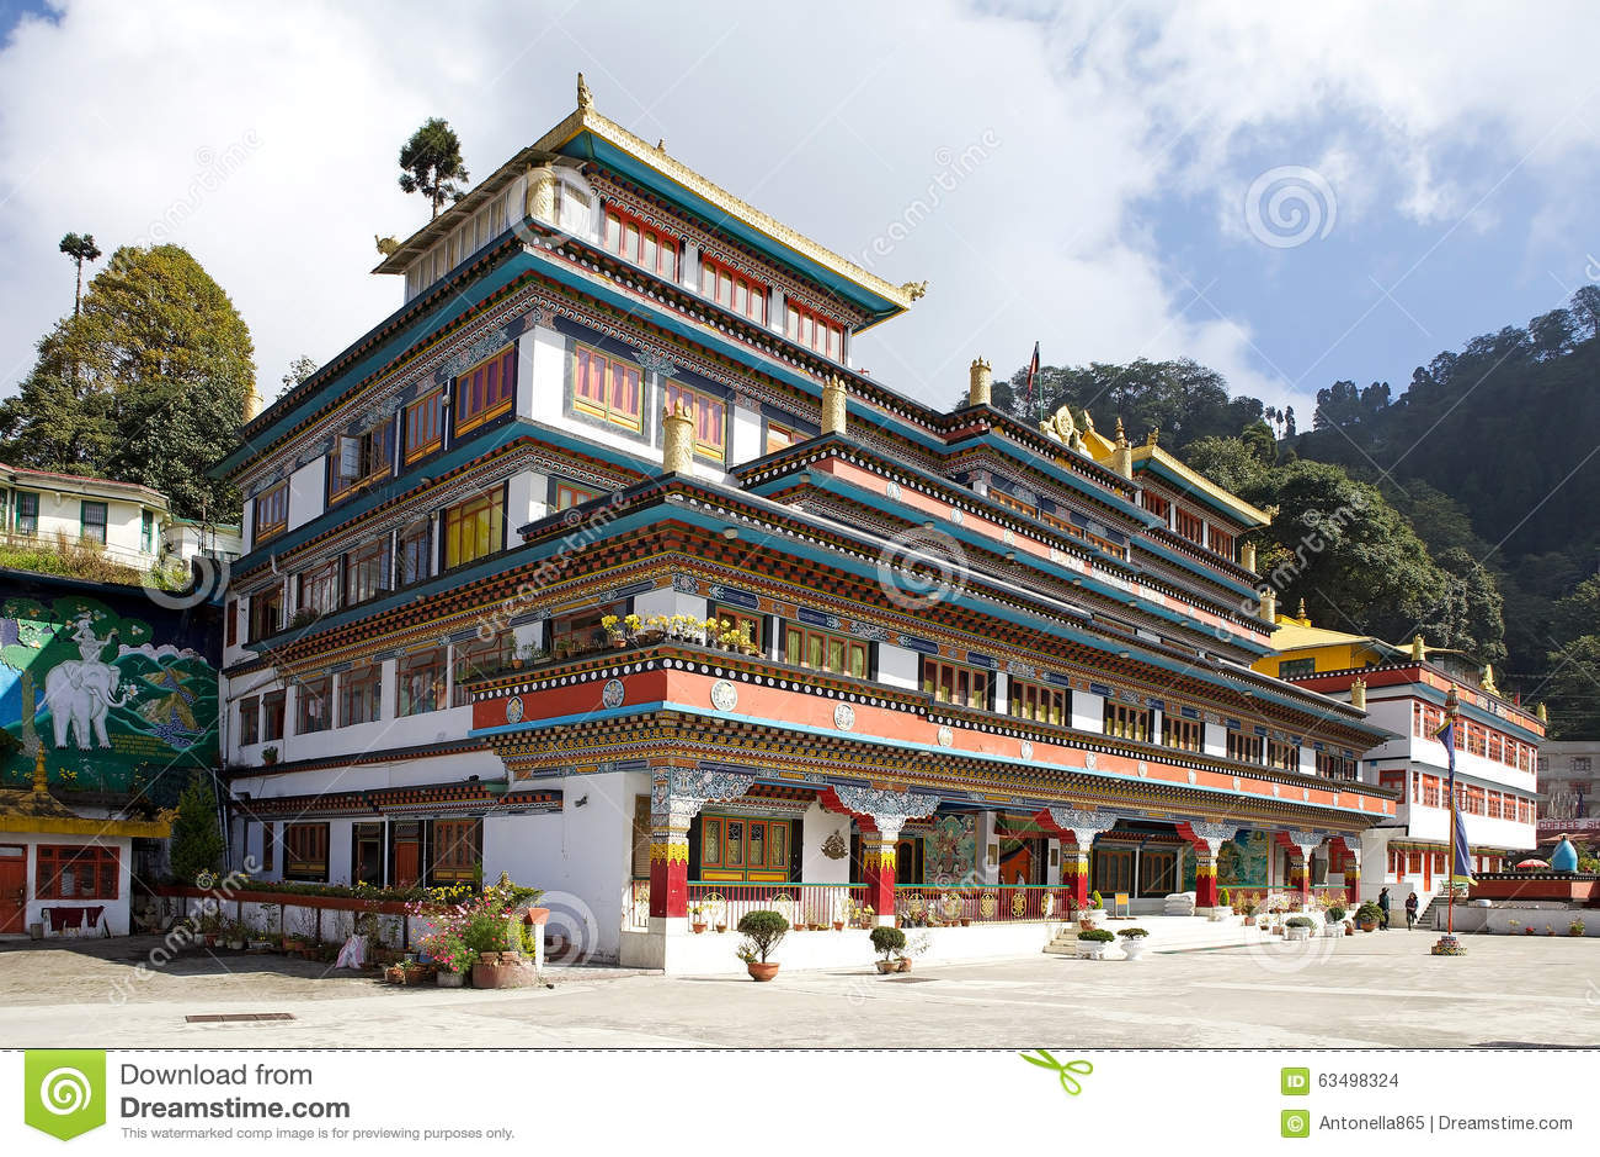 Dali Monastery Darjeeling India Editorial Stock Image Image Of